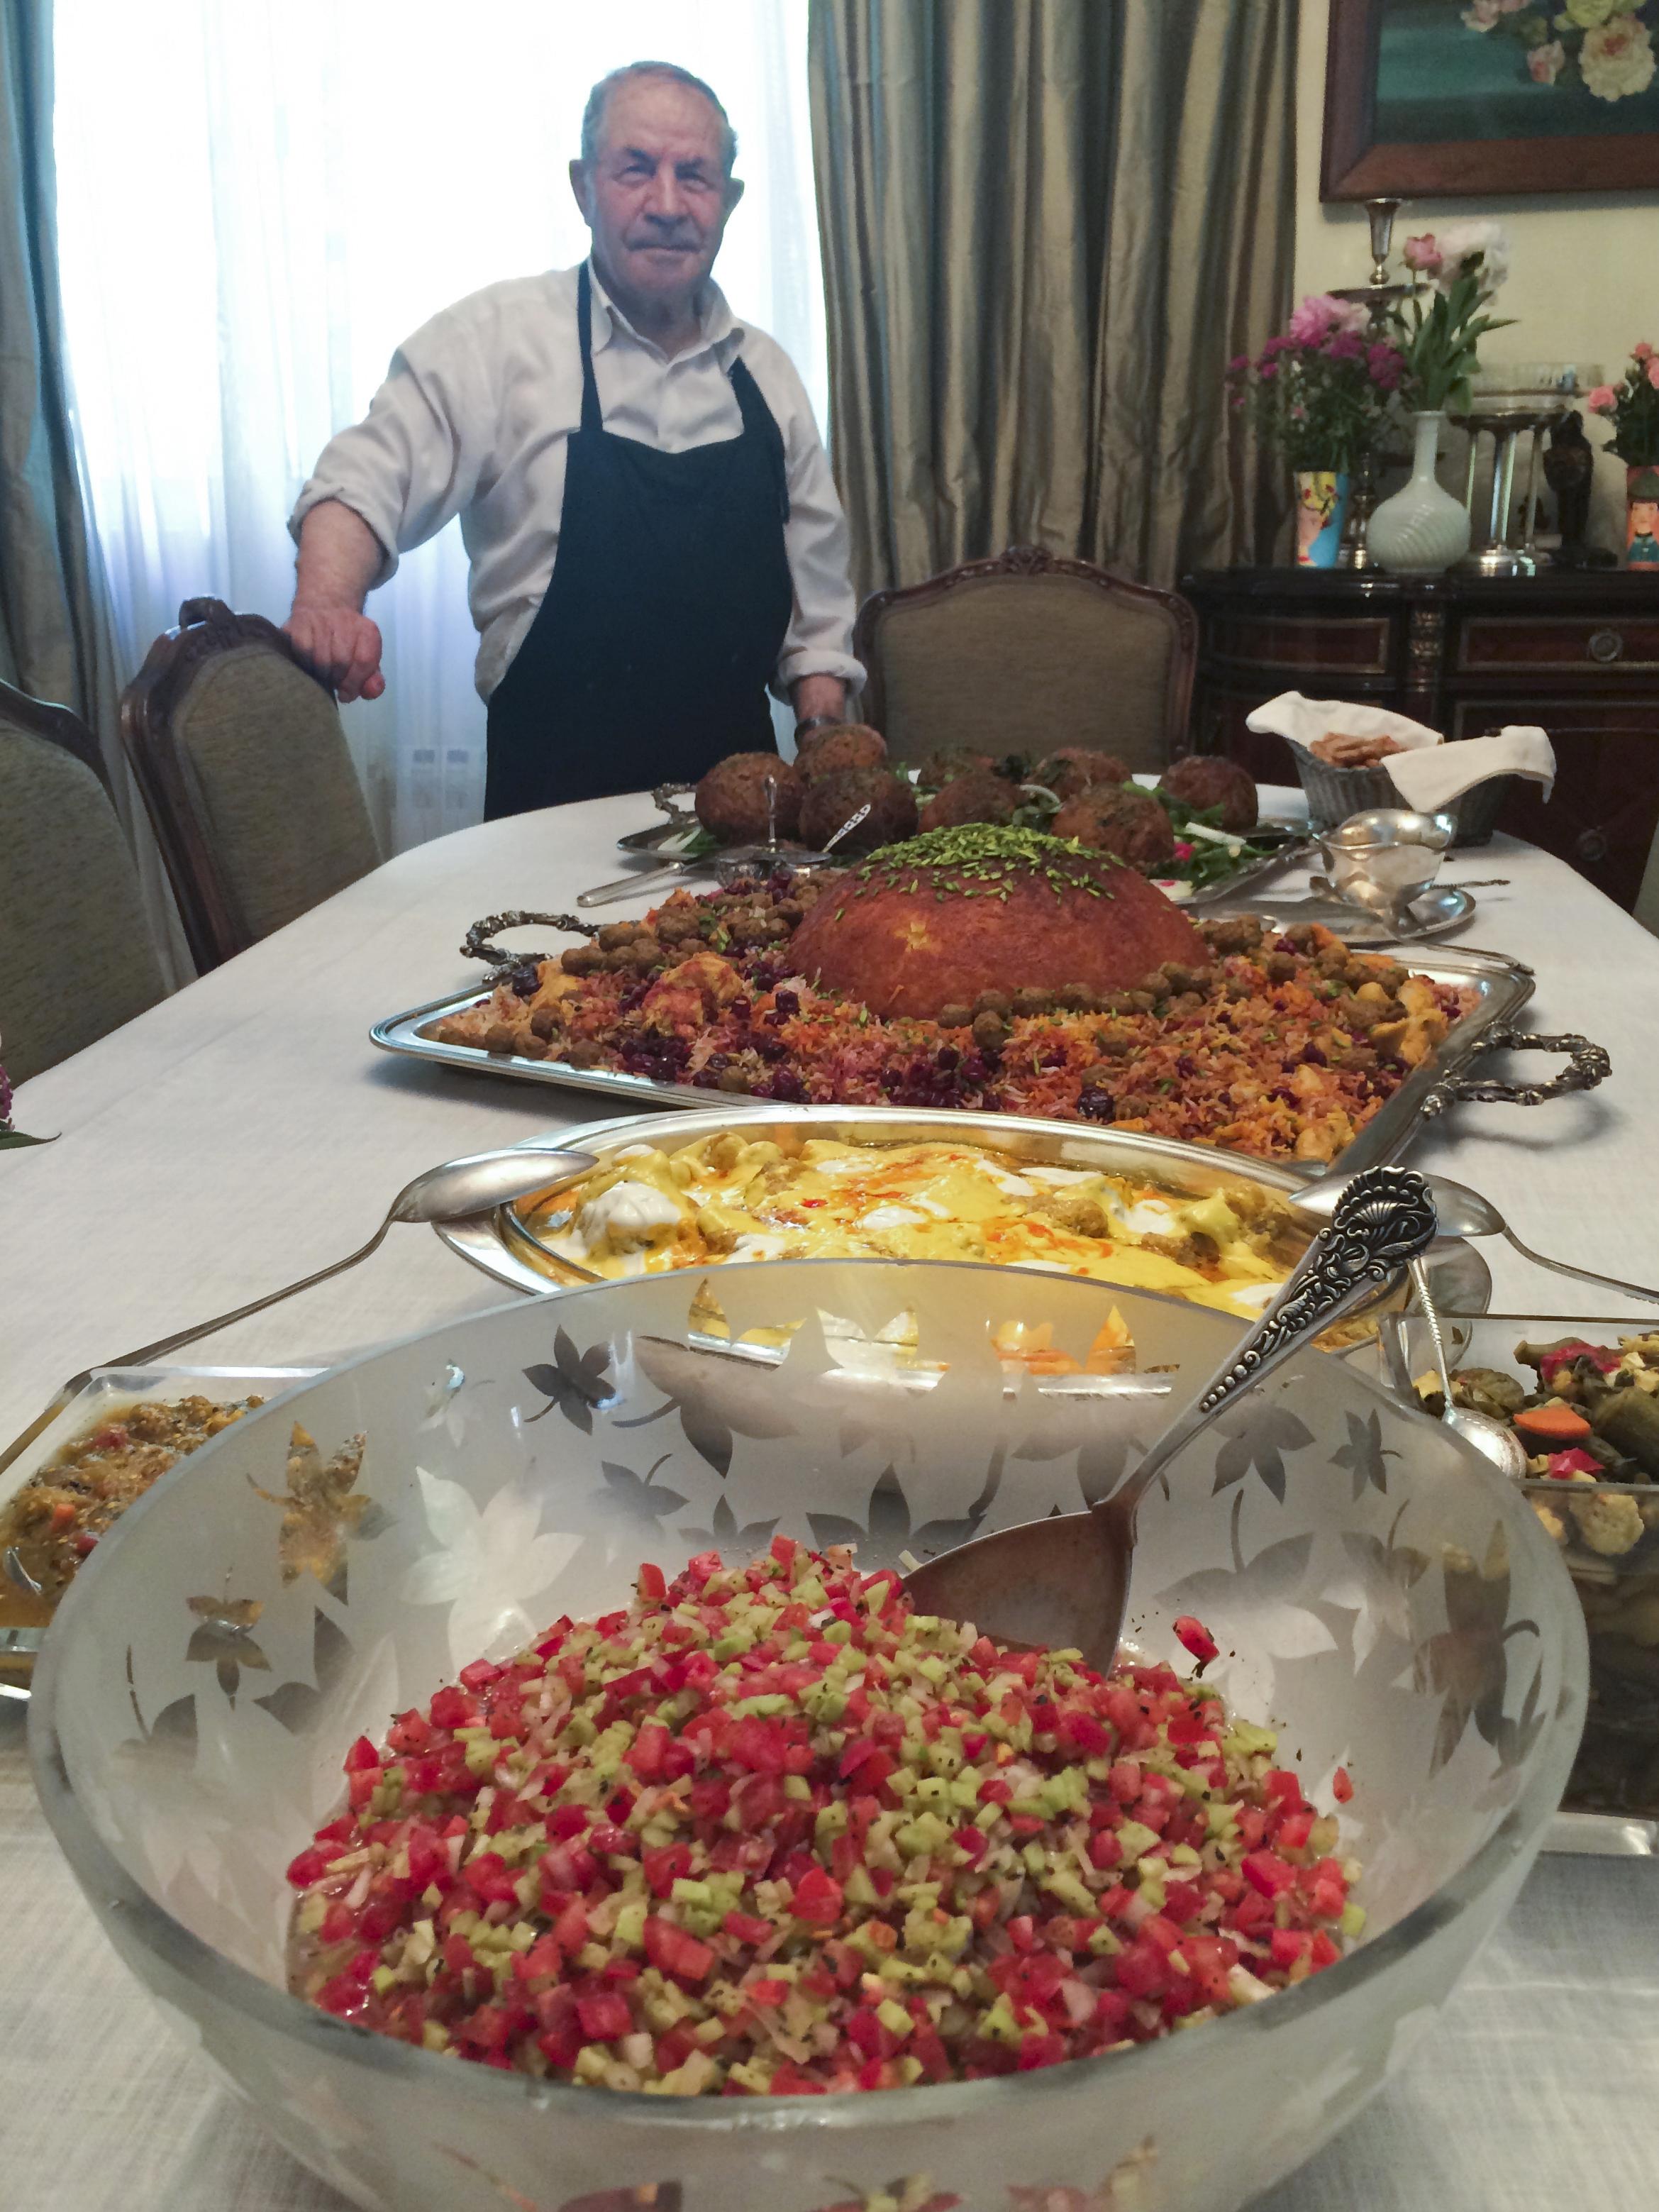 Nazila Noebashari's cook, Rahim, with the beautiful feast he created. (Photo by Erik Osterholm)